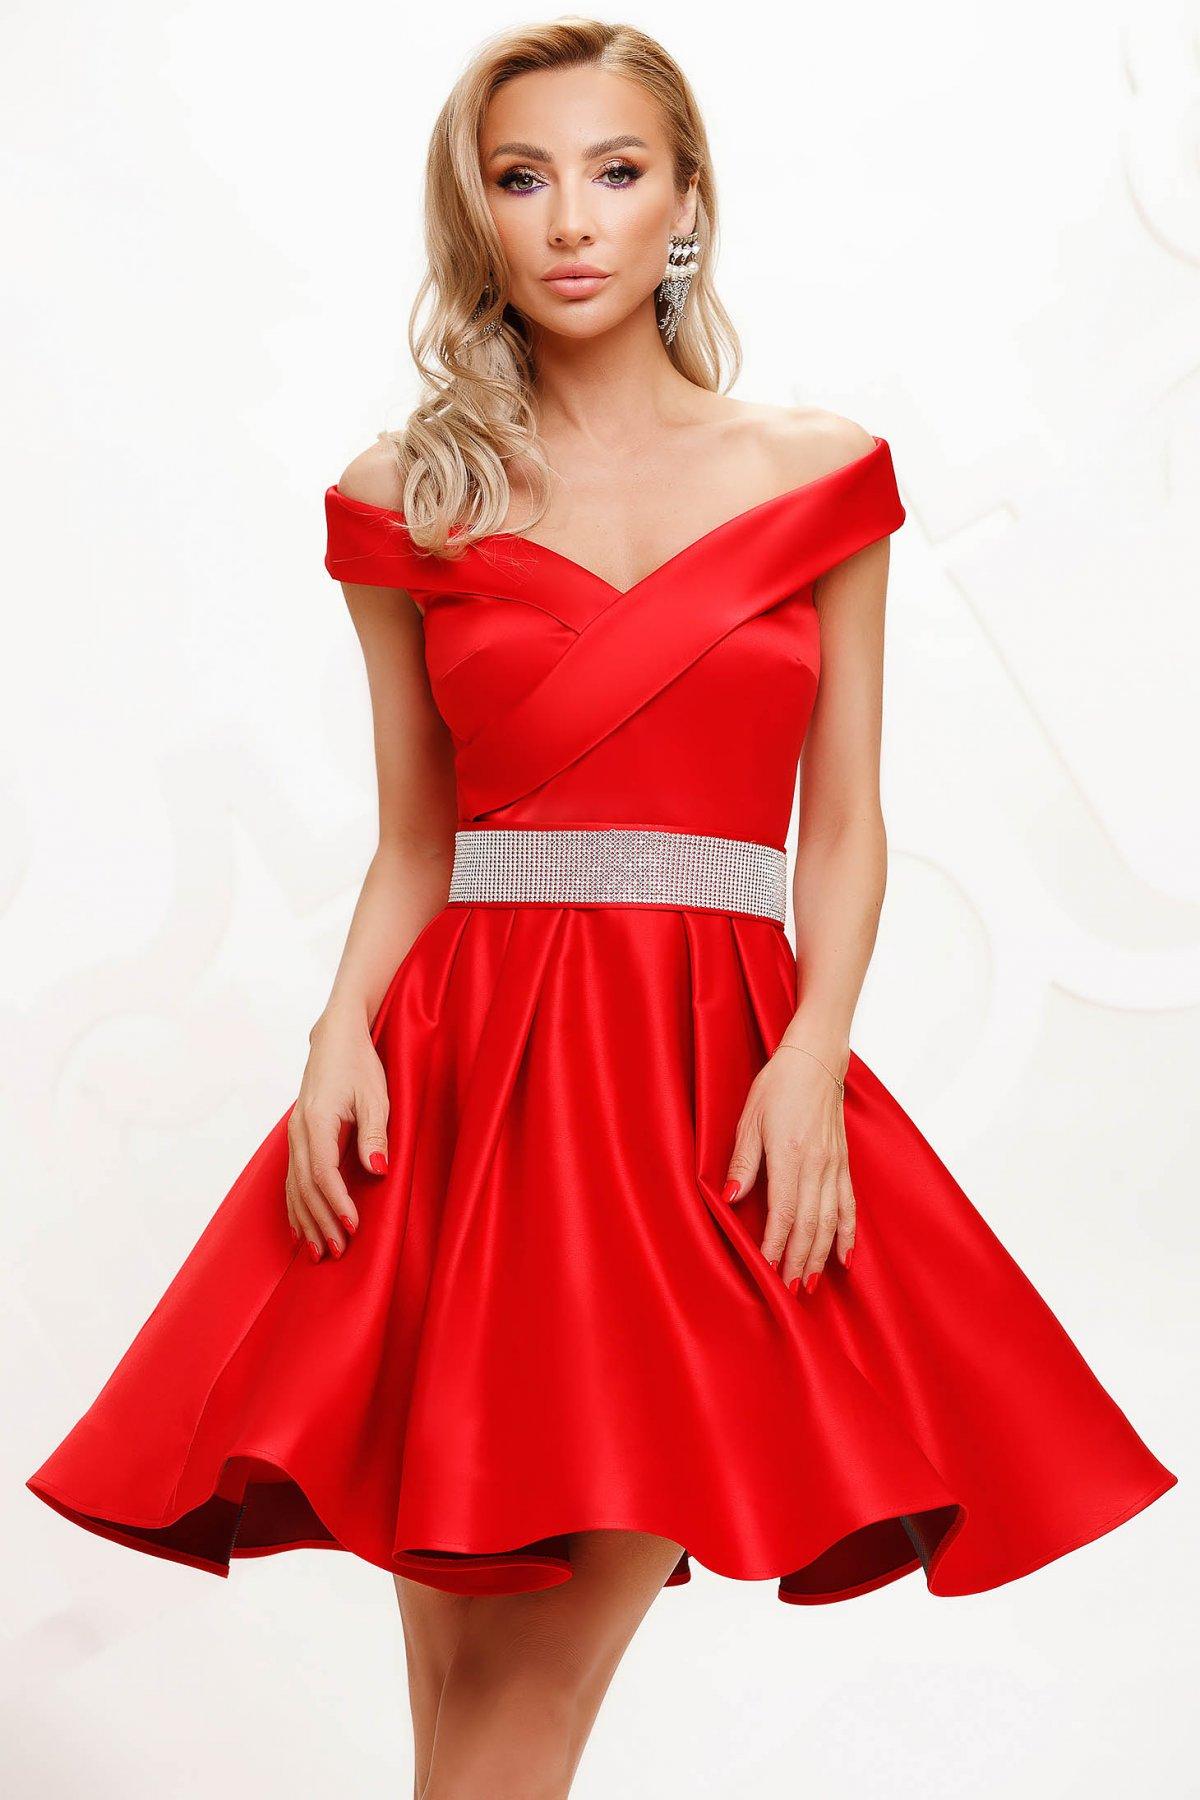 Rochie Artista rosie din satin de ocazie in clos accesorizata cu o centura pe umeri